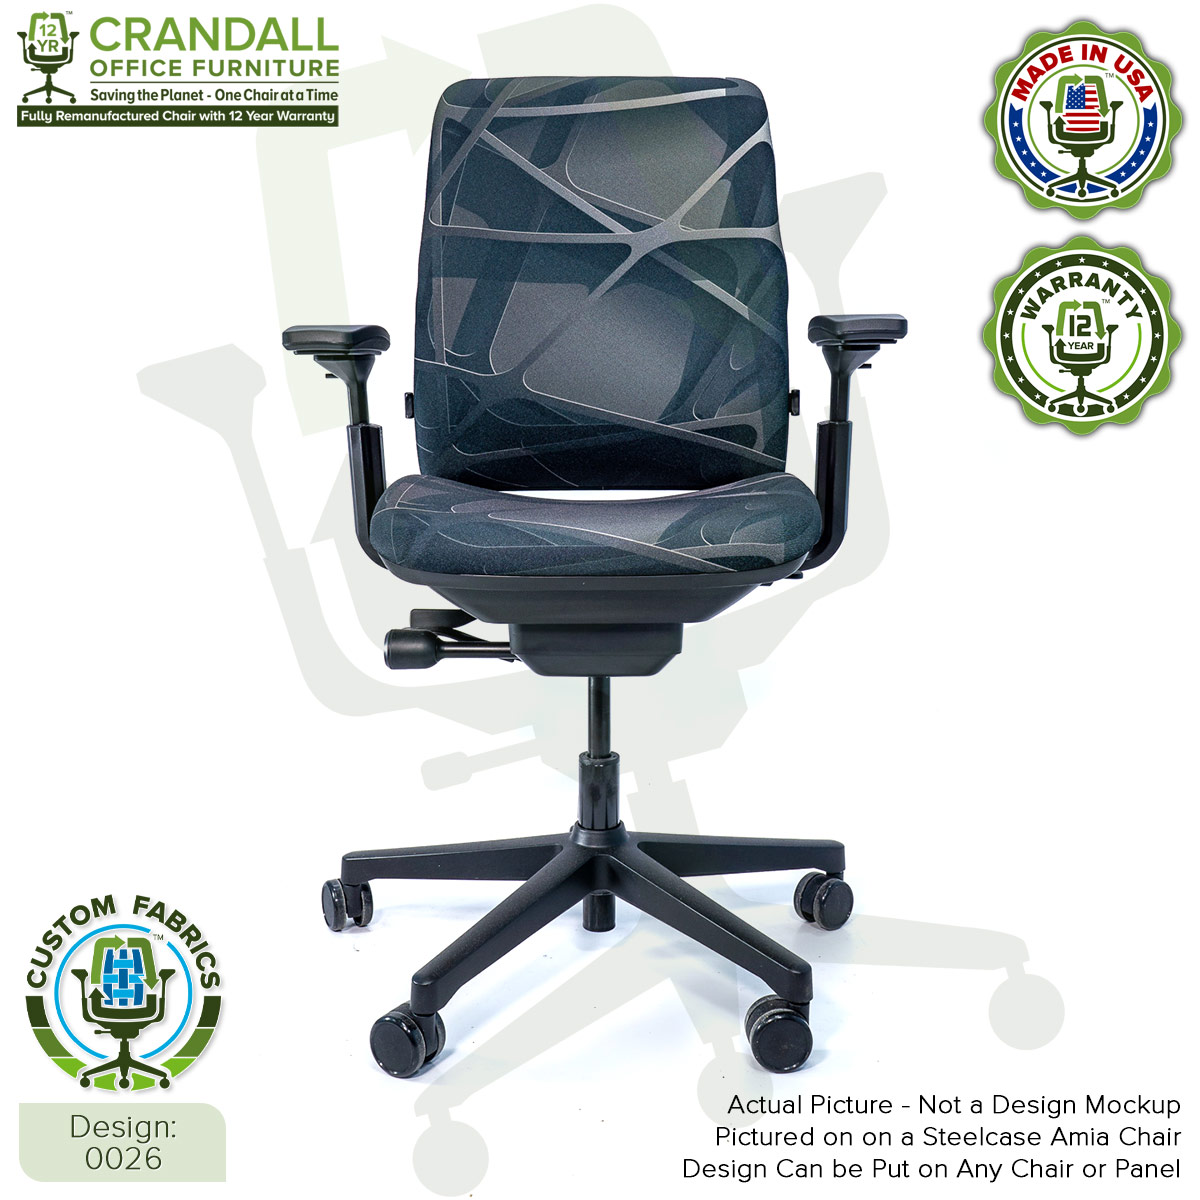 Custom Fabric Remanufactured Steelcase Amia Chair - Design 0026